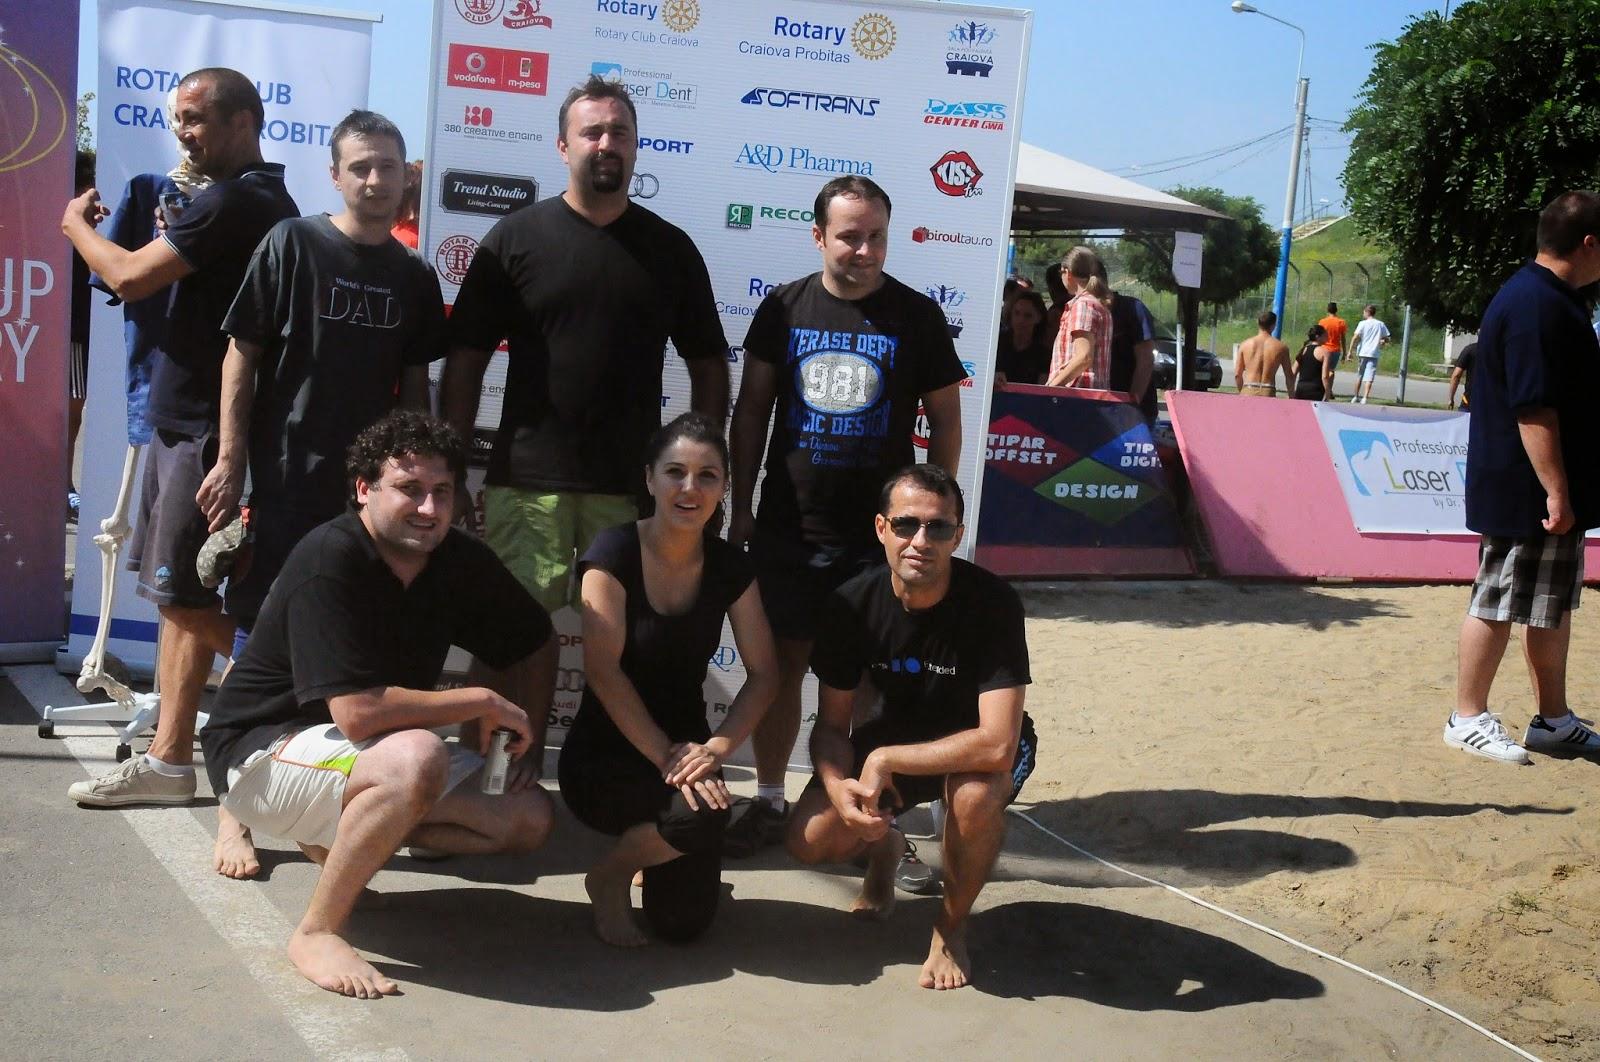 Craiova Bloggers Team